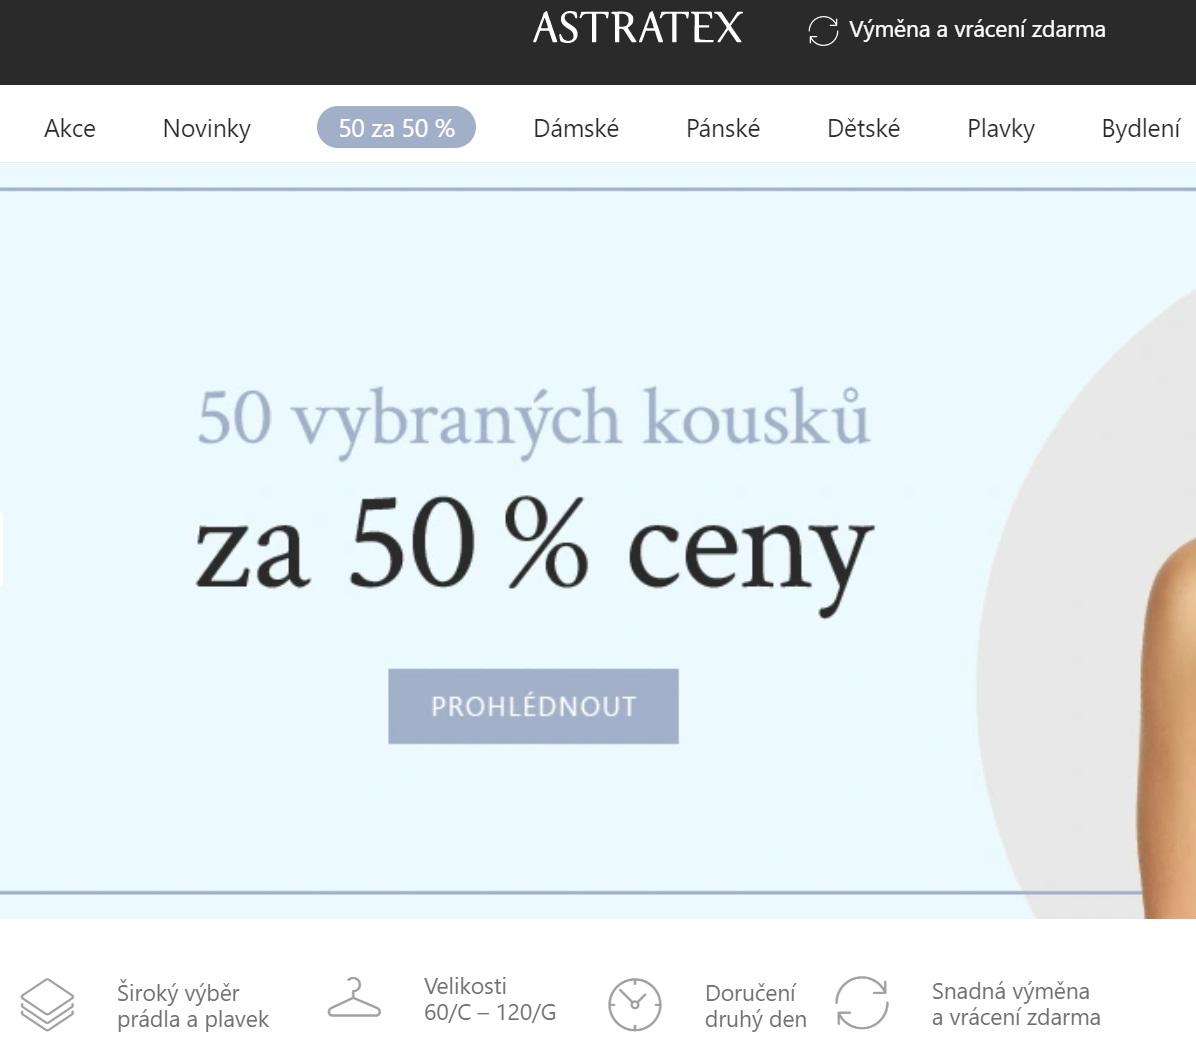 Eshop Astratex reacenze a hodnocení online